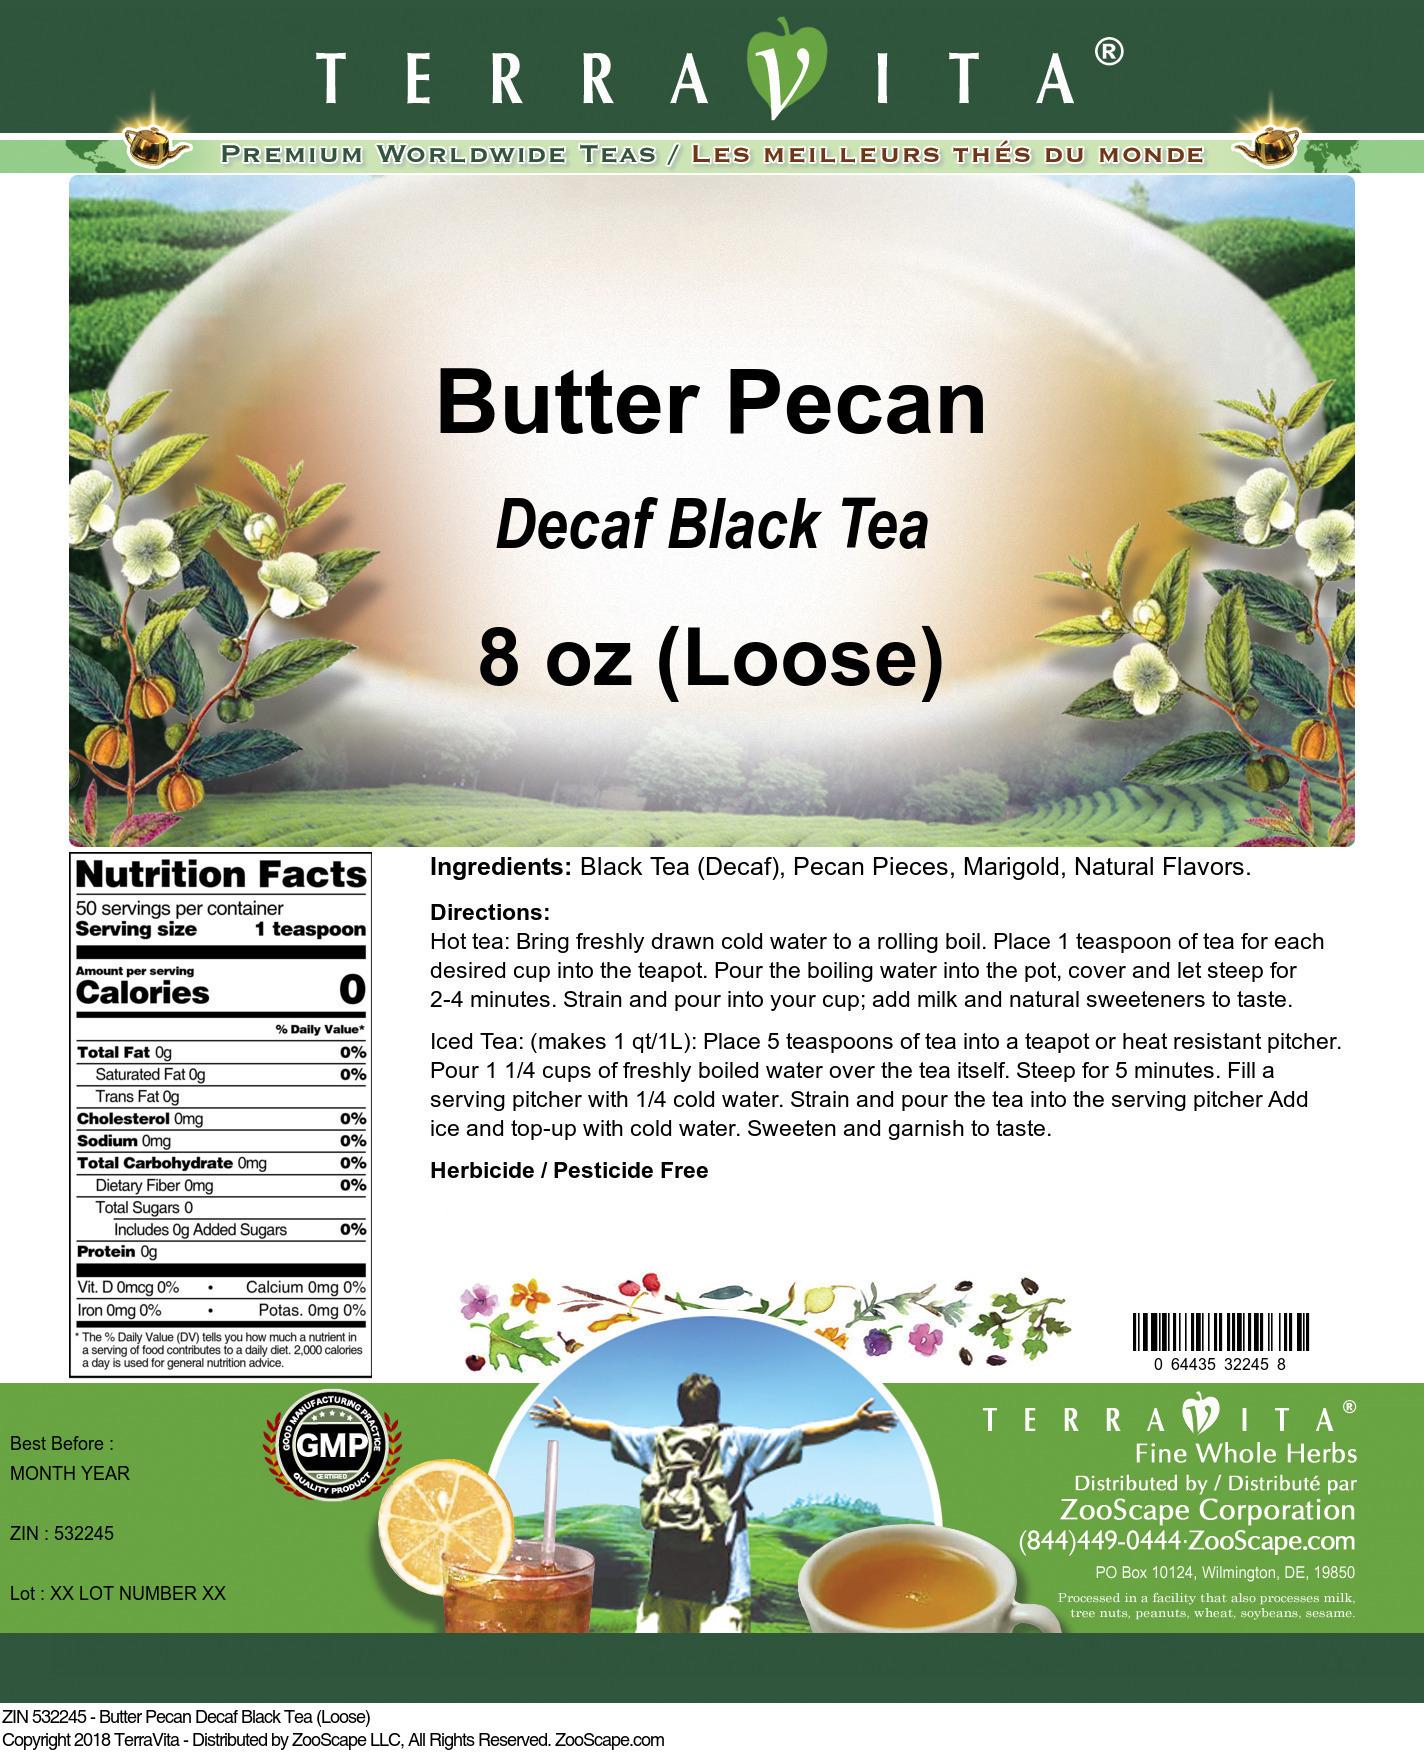 Butter Pecan Decaf Black Tea